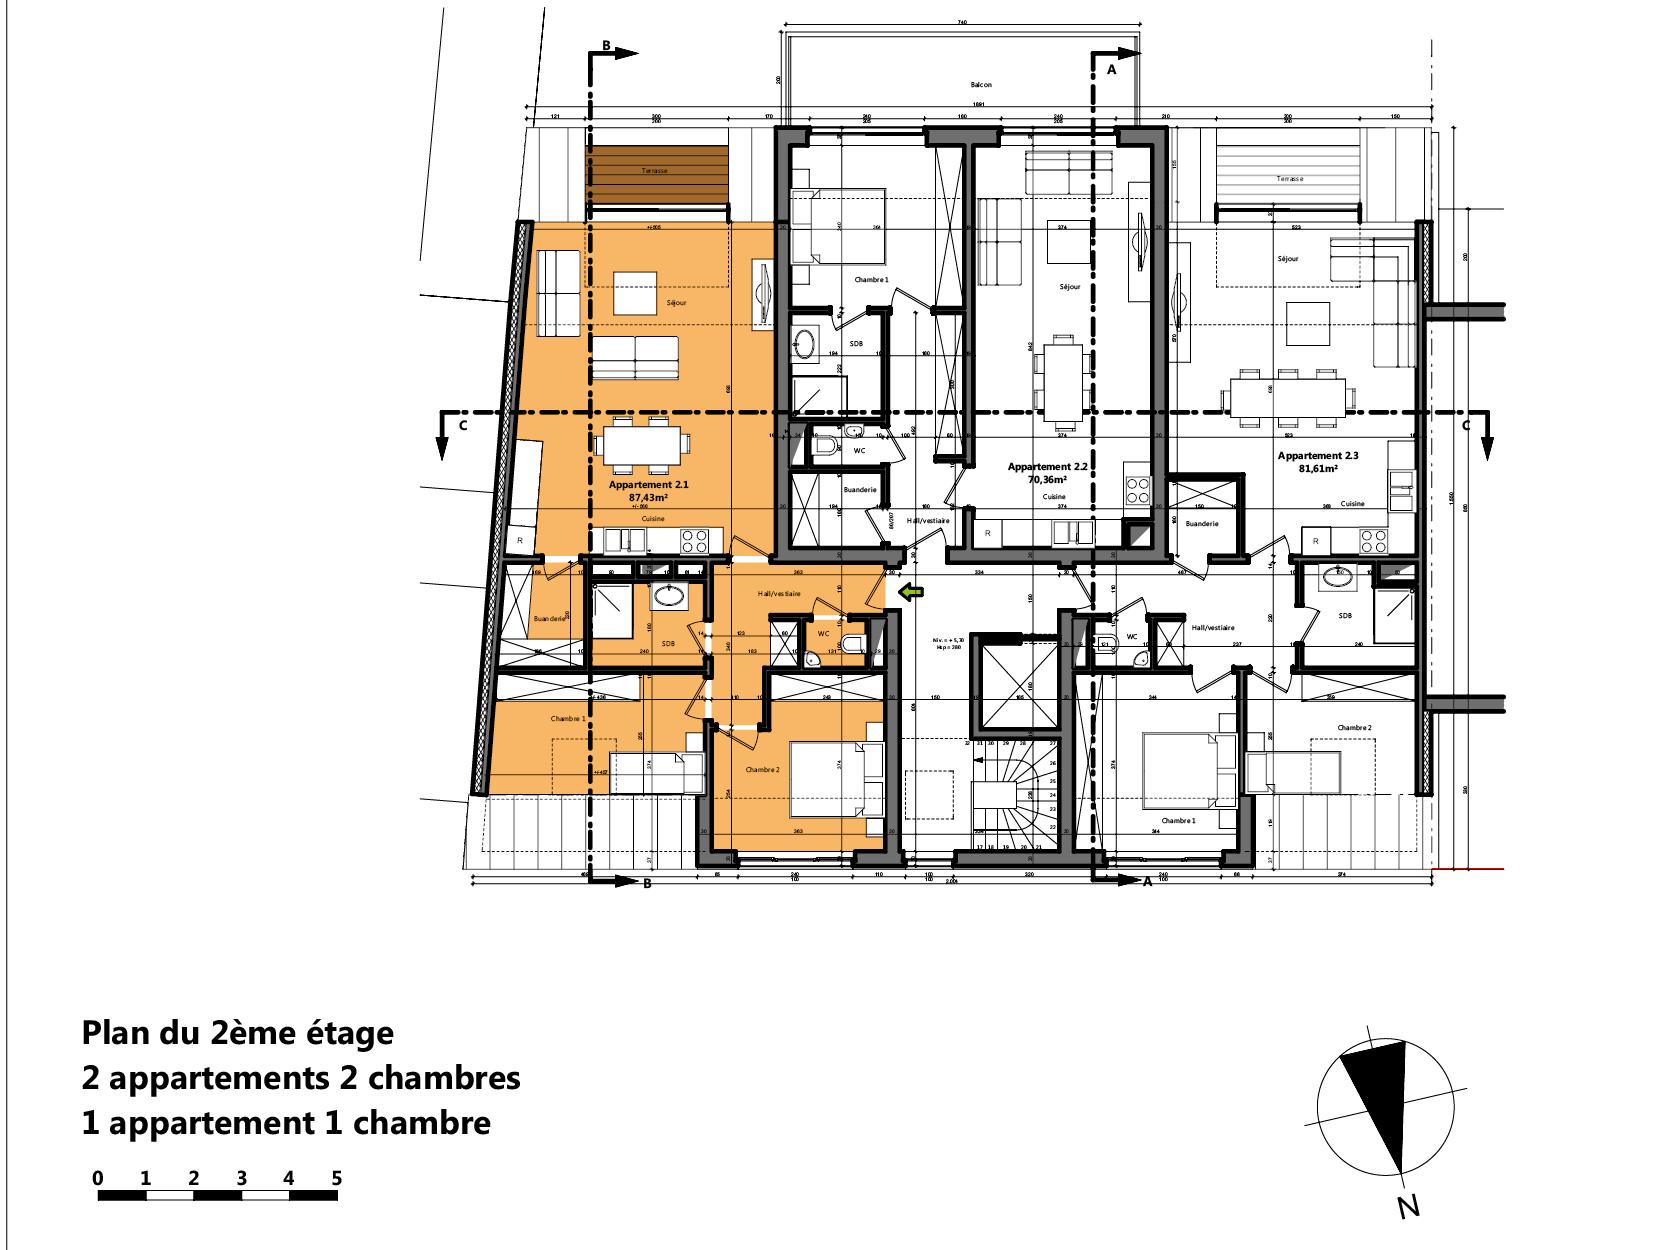 Plan appartement a vendre hermalle a5 vue 2eme etage t palm for Appartement plan